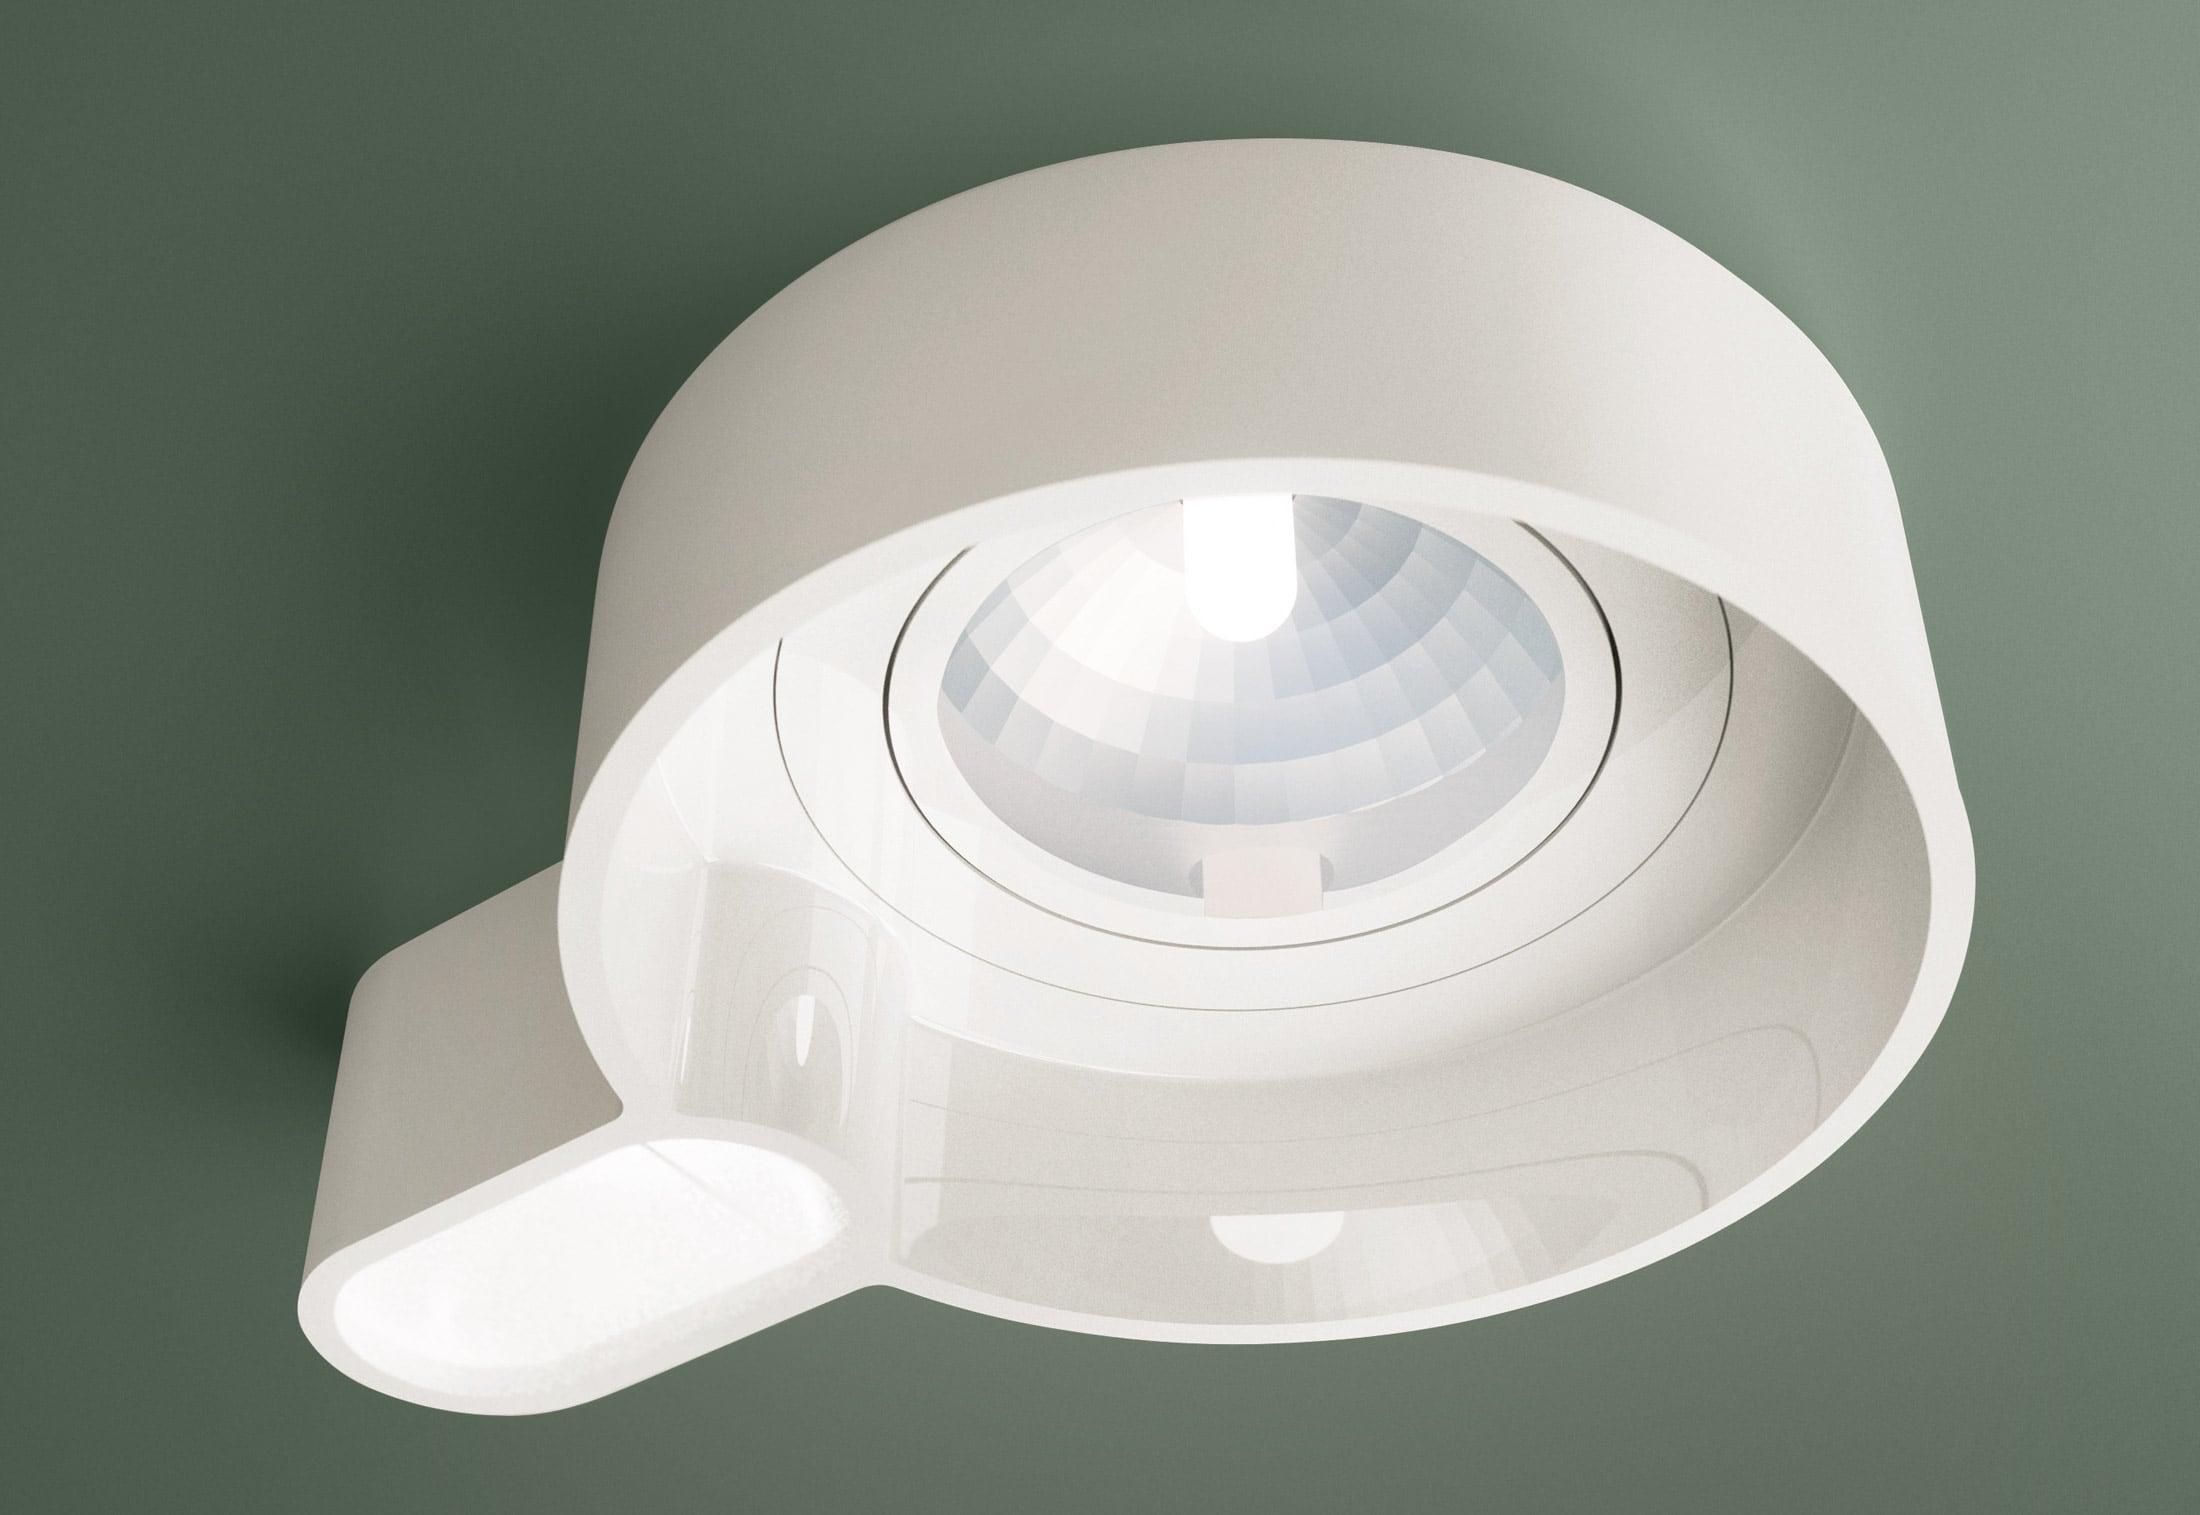 Eyelet Itre (Leucos) halogenové svítidlo SD 007 1X50W GU5,3